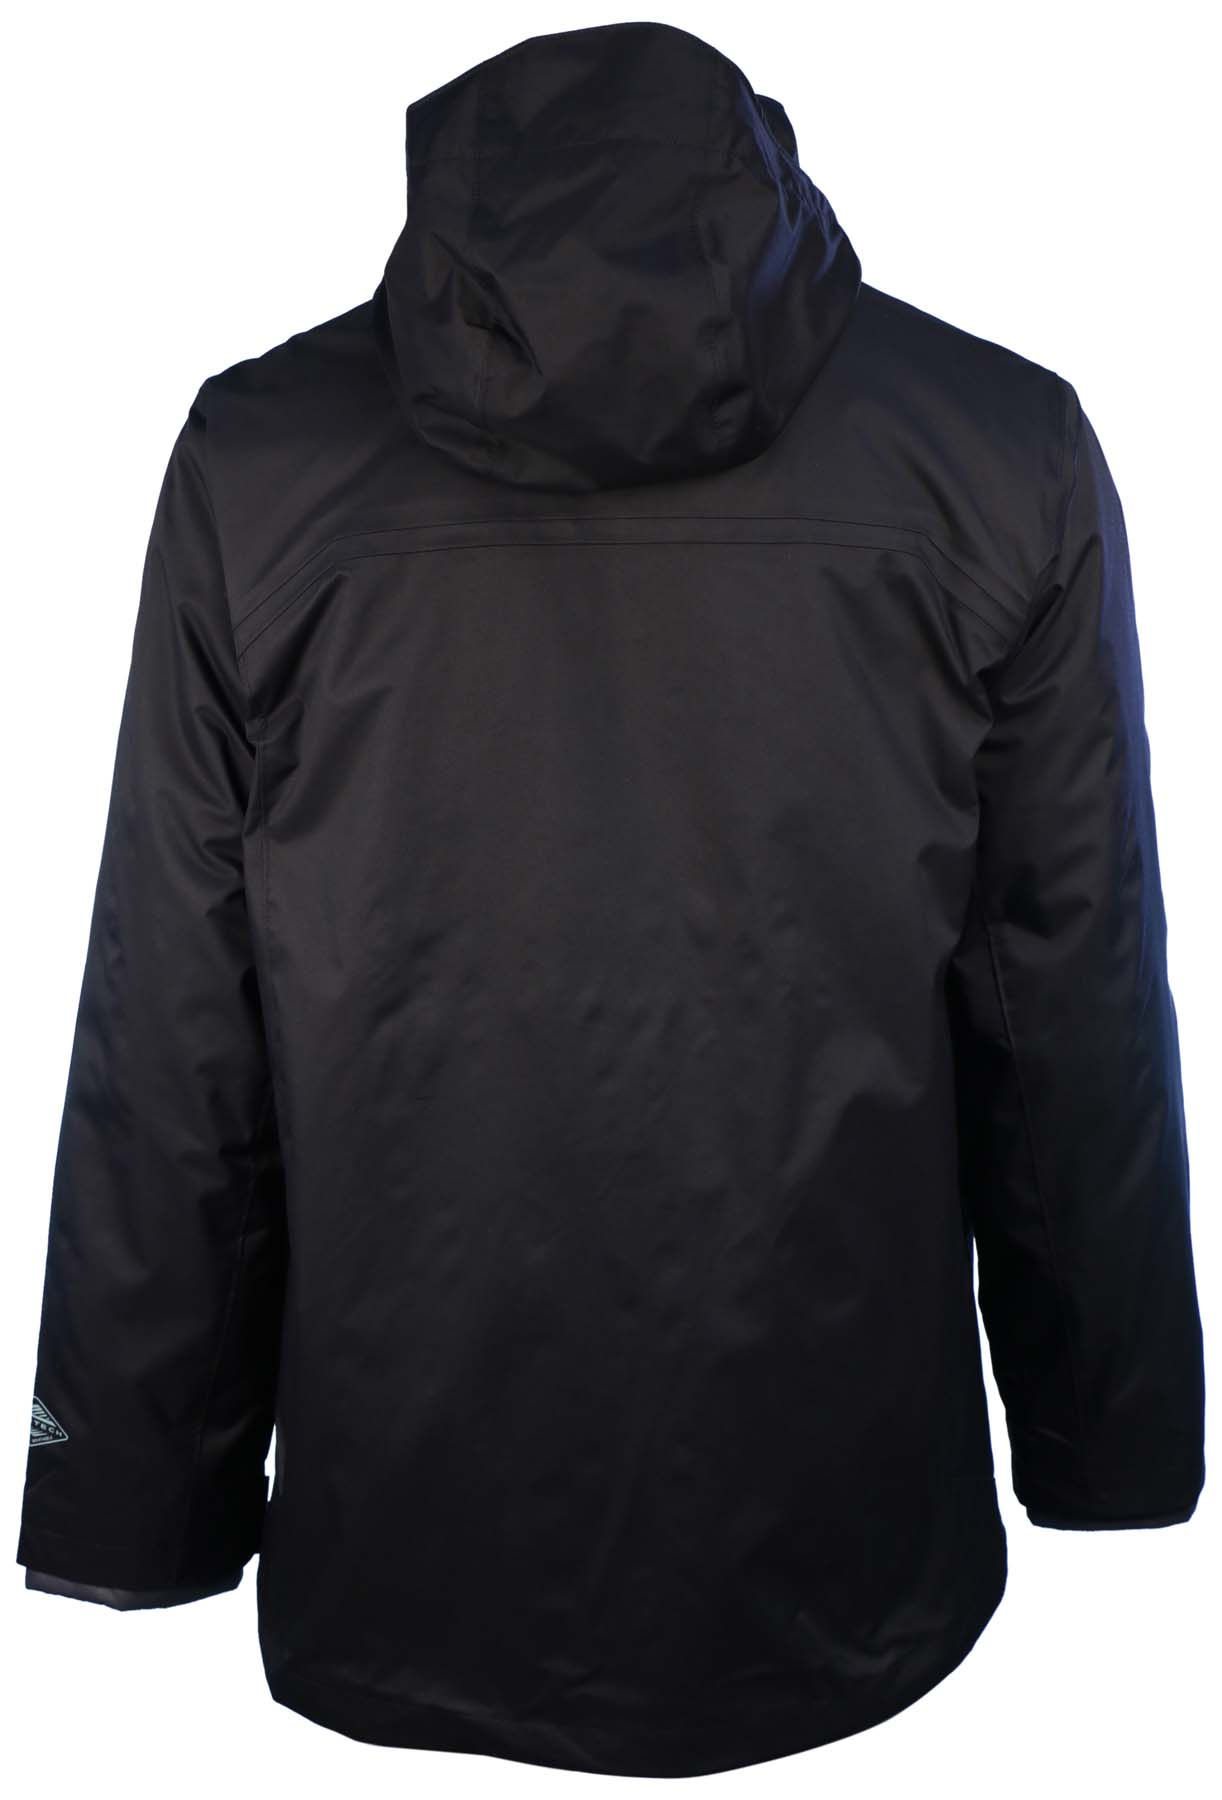 Columbia Mens Nordic Point II Interchange Jacket EBay